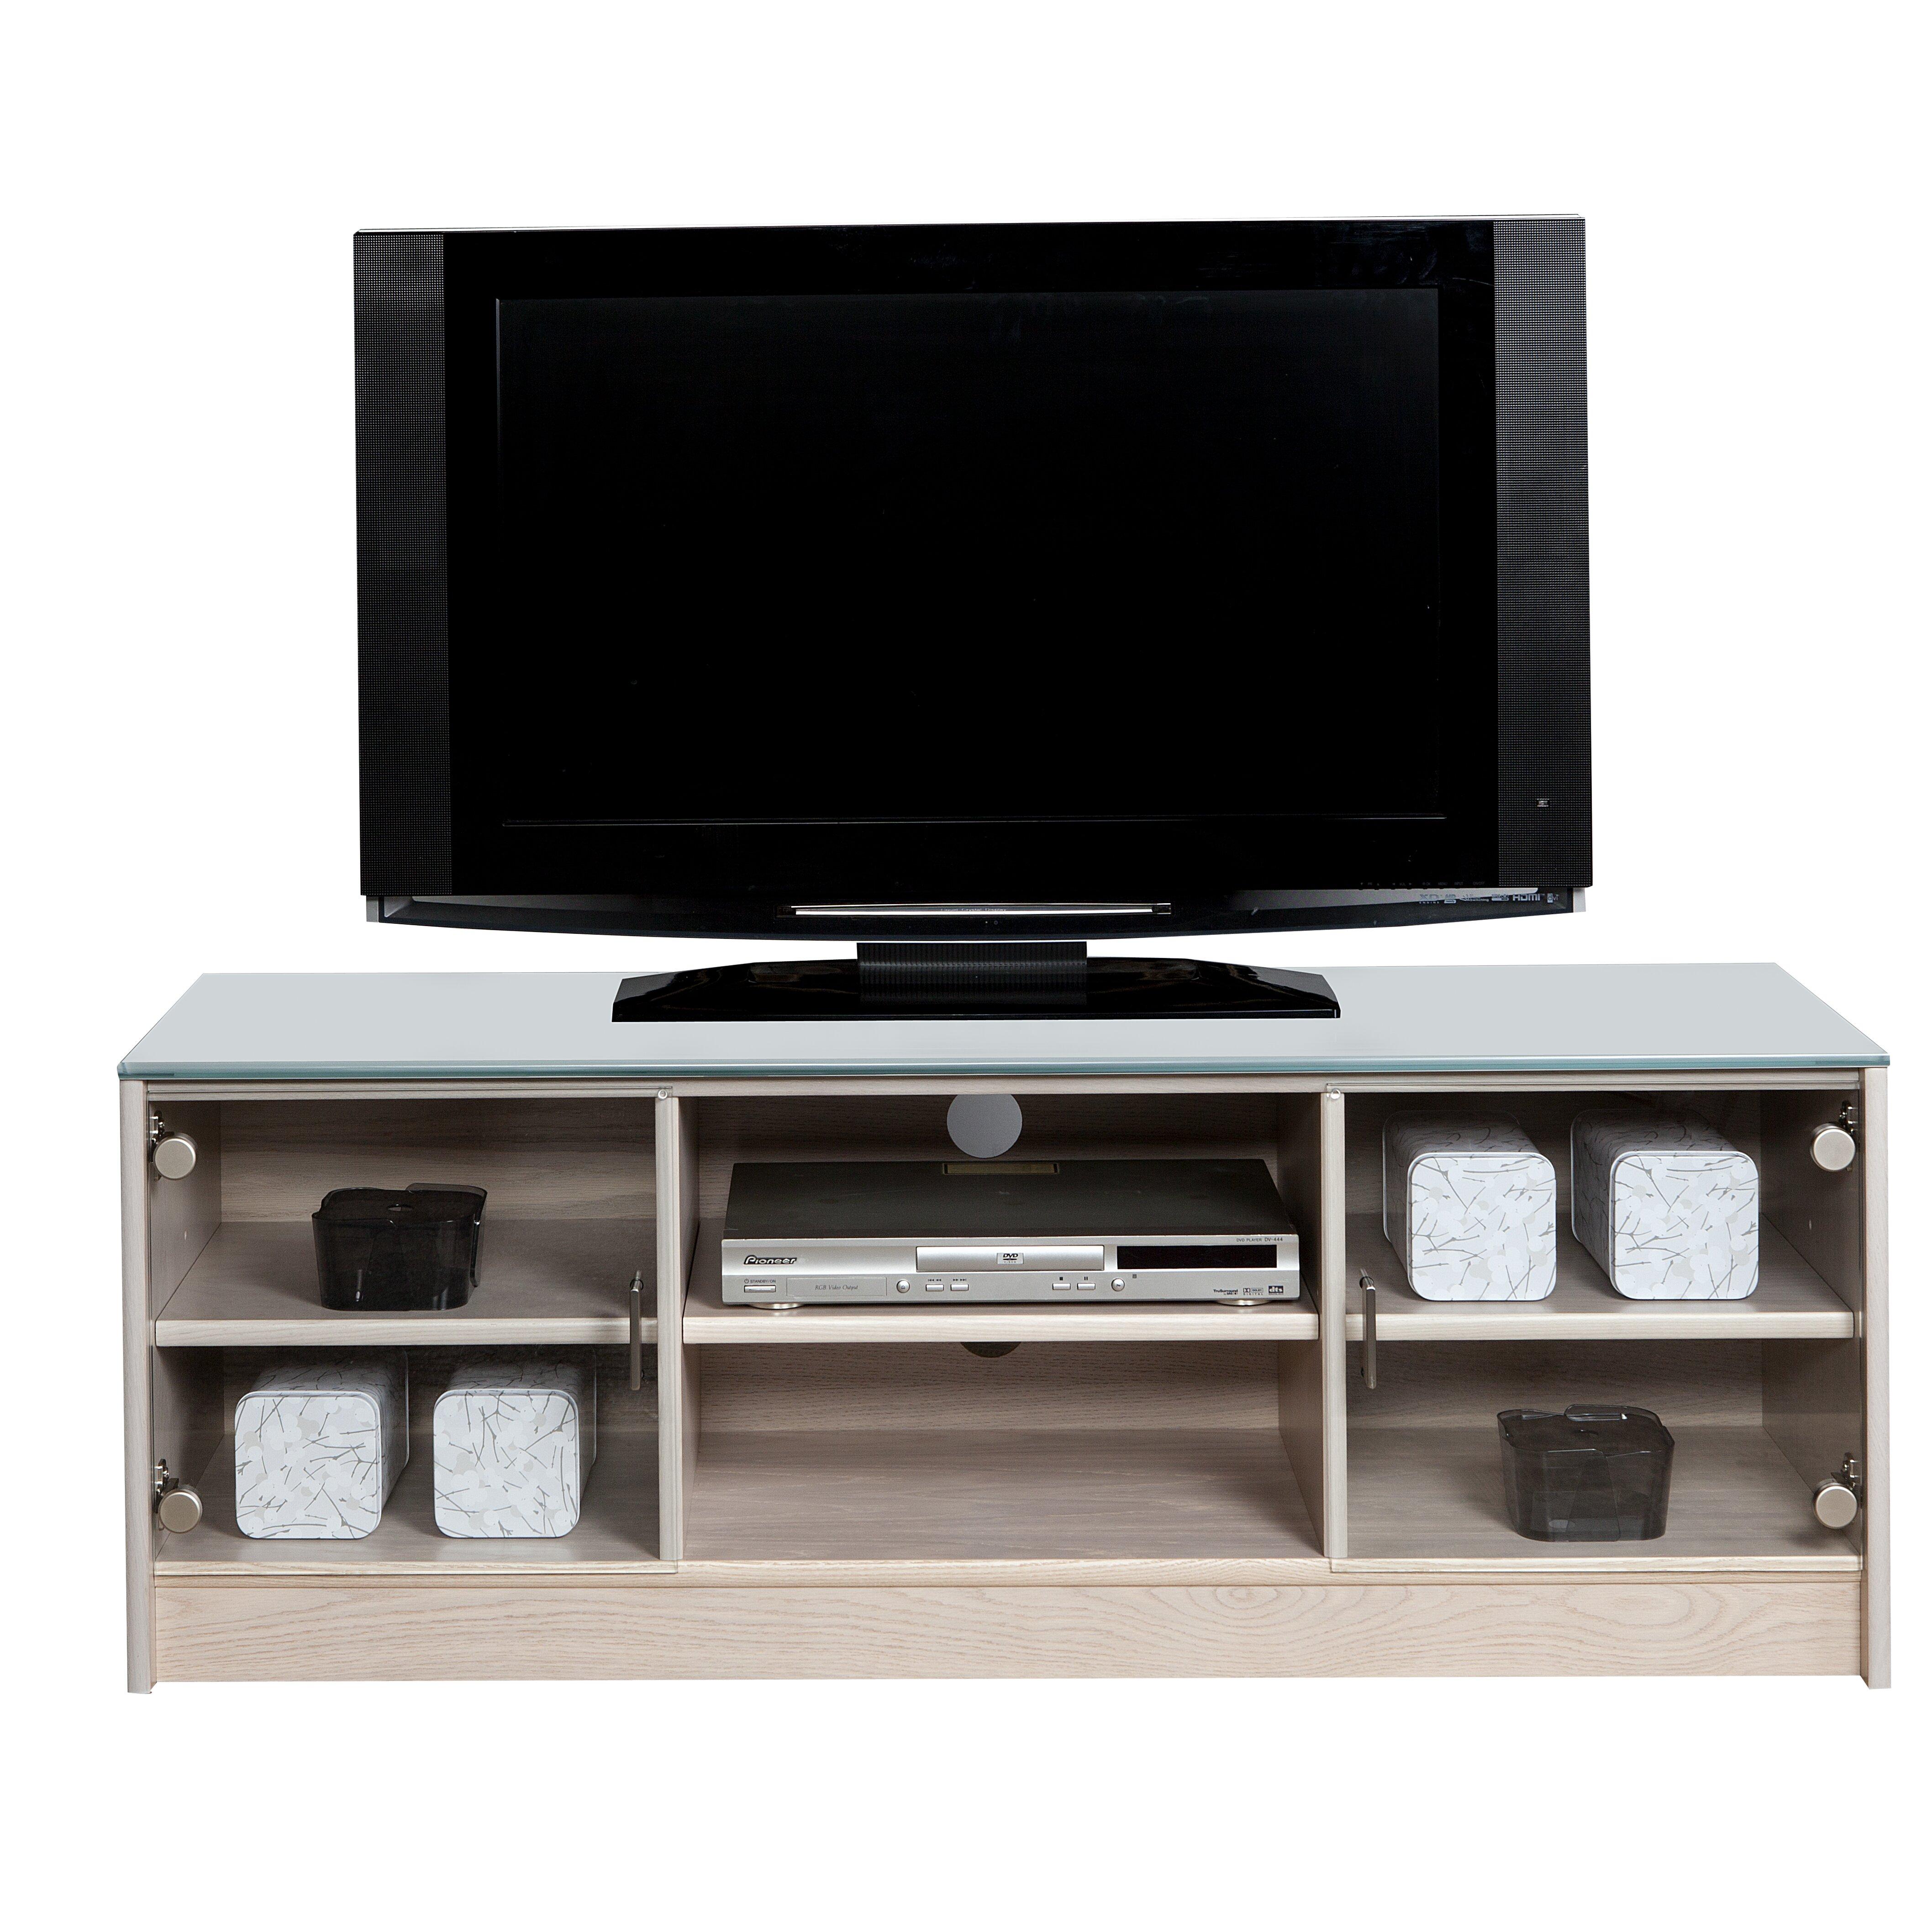 Ikea Besta Regal Aufbewahrungssystem